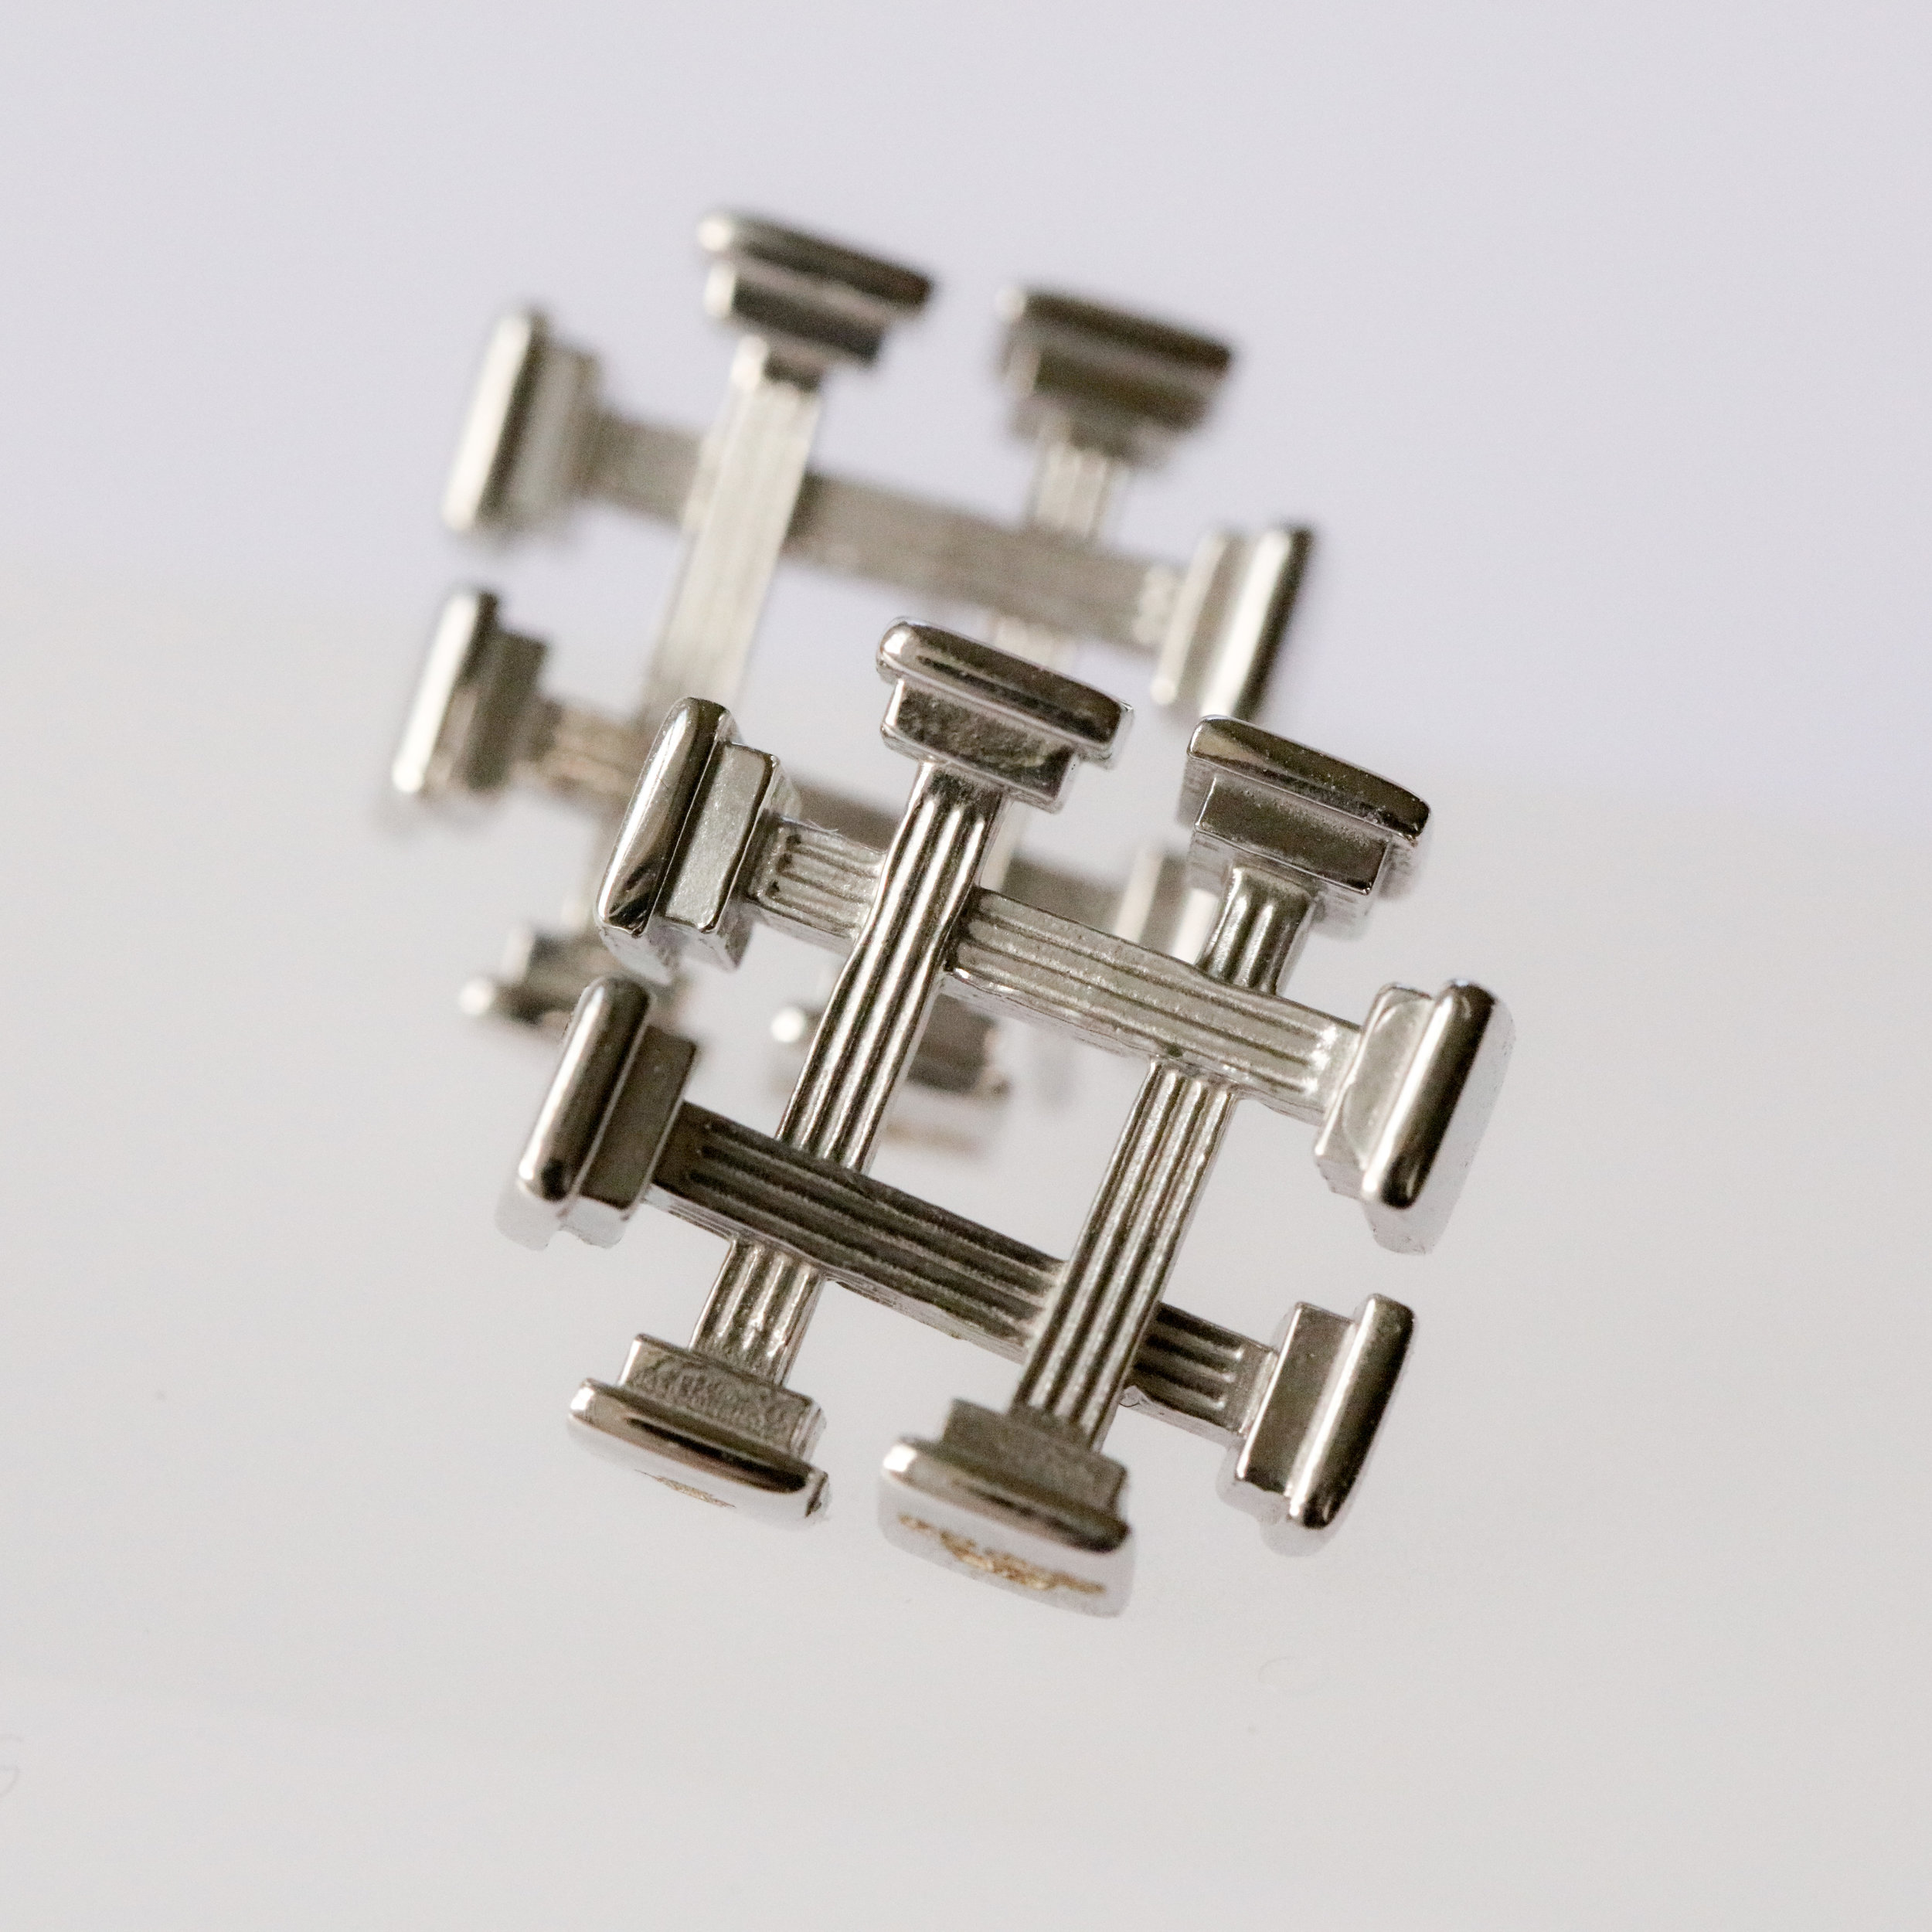 Ruin Earrings in 18ct white gold